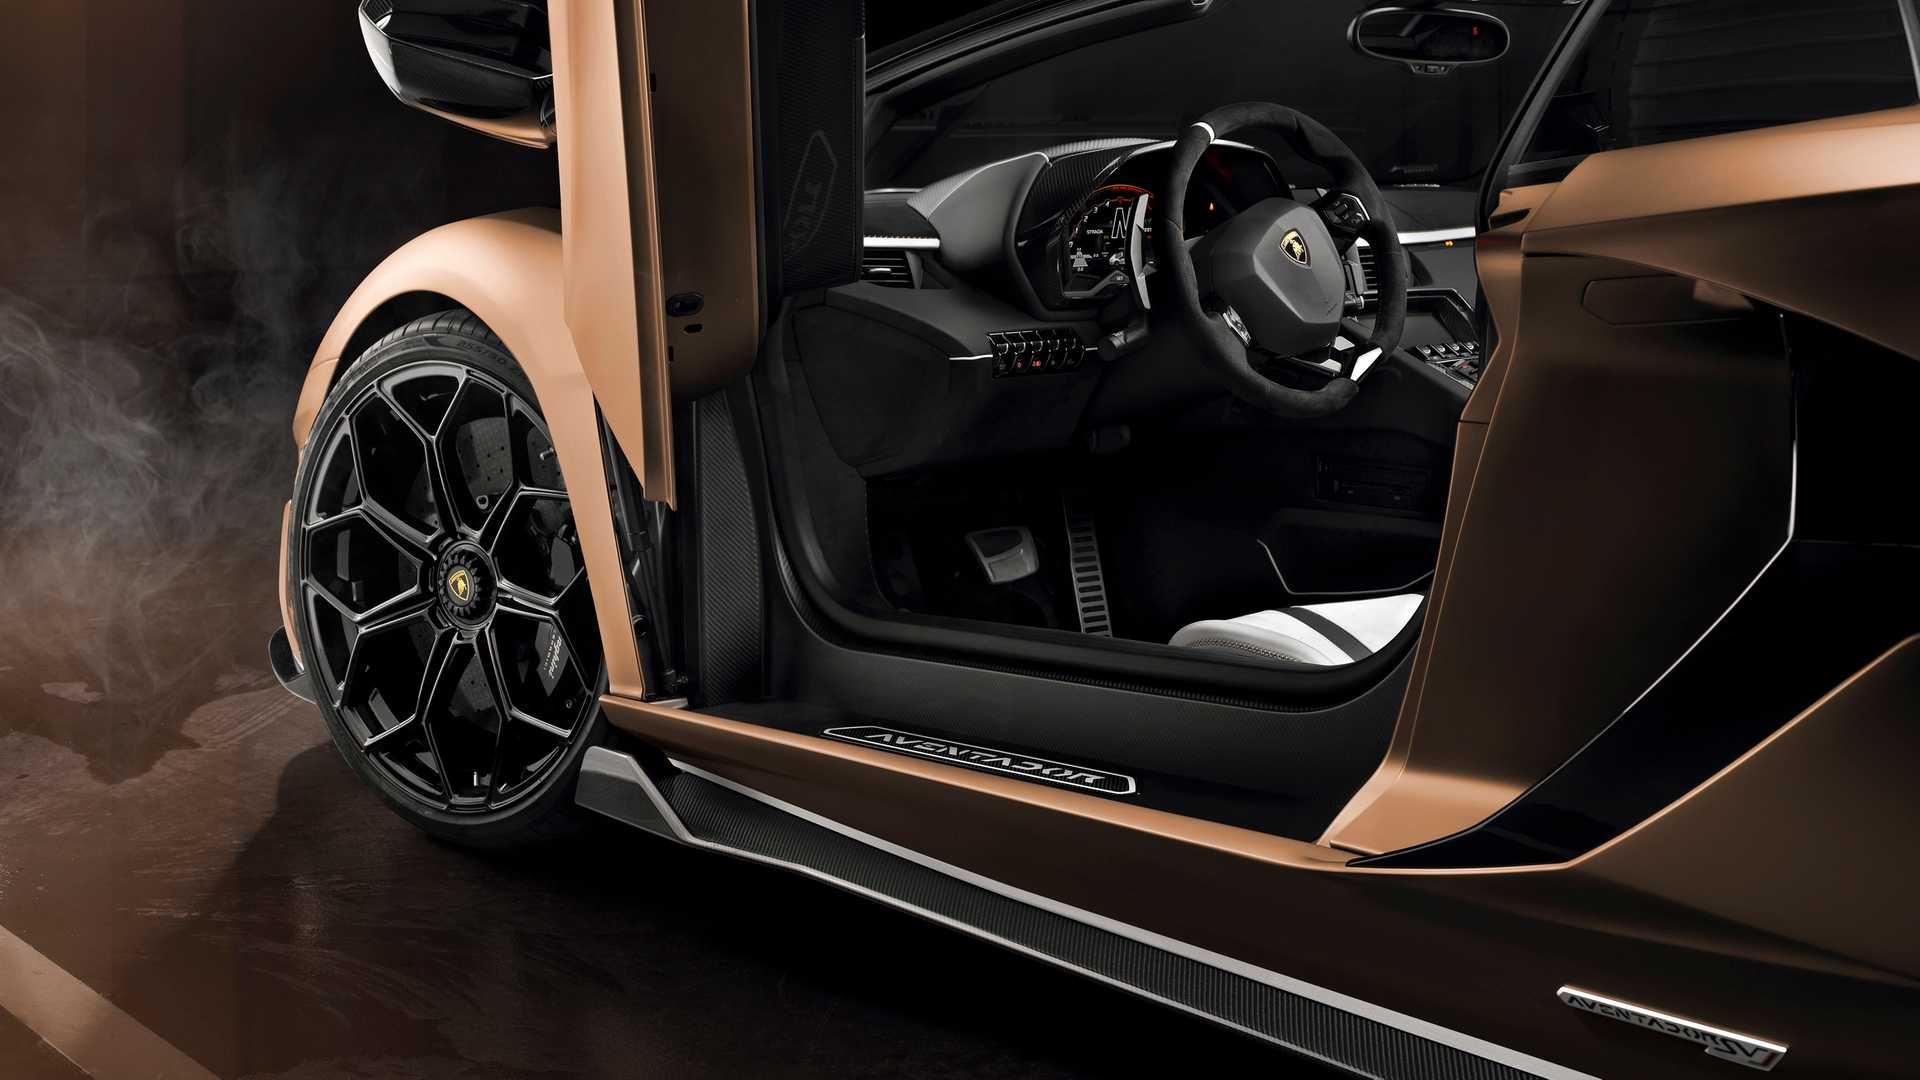 2020 Lamborghini Aventador Svj Roadster Interior Seats Wallpaper 18